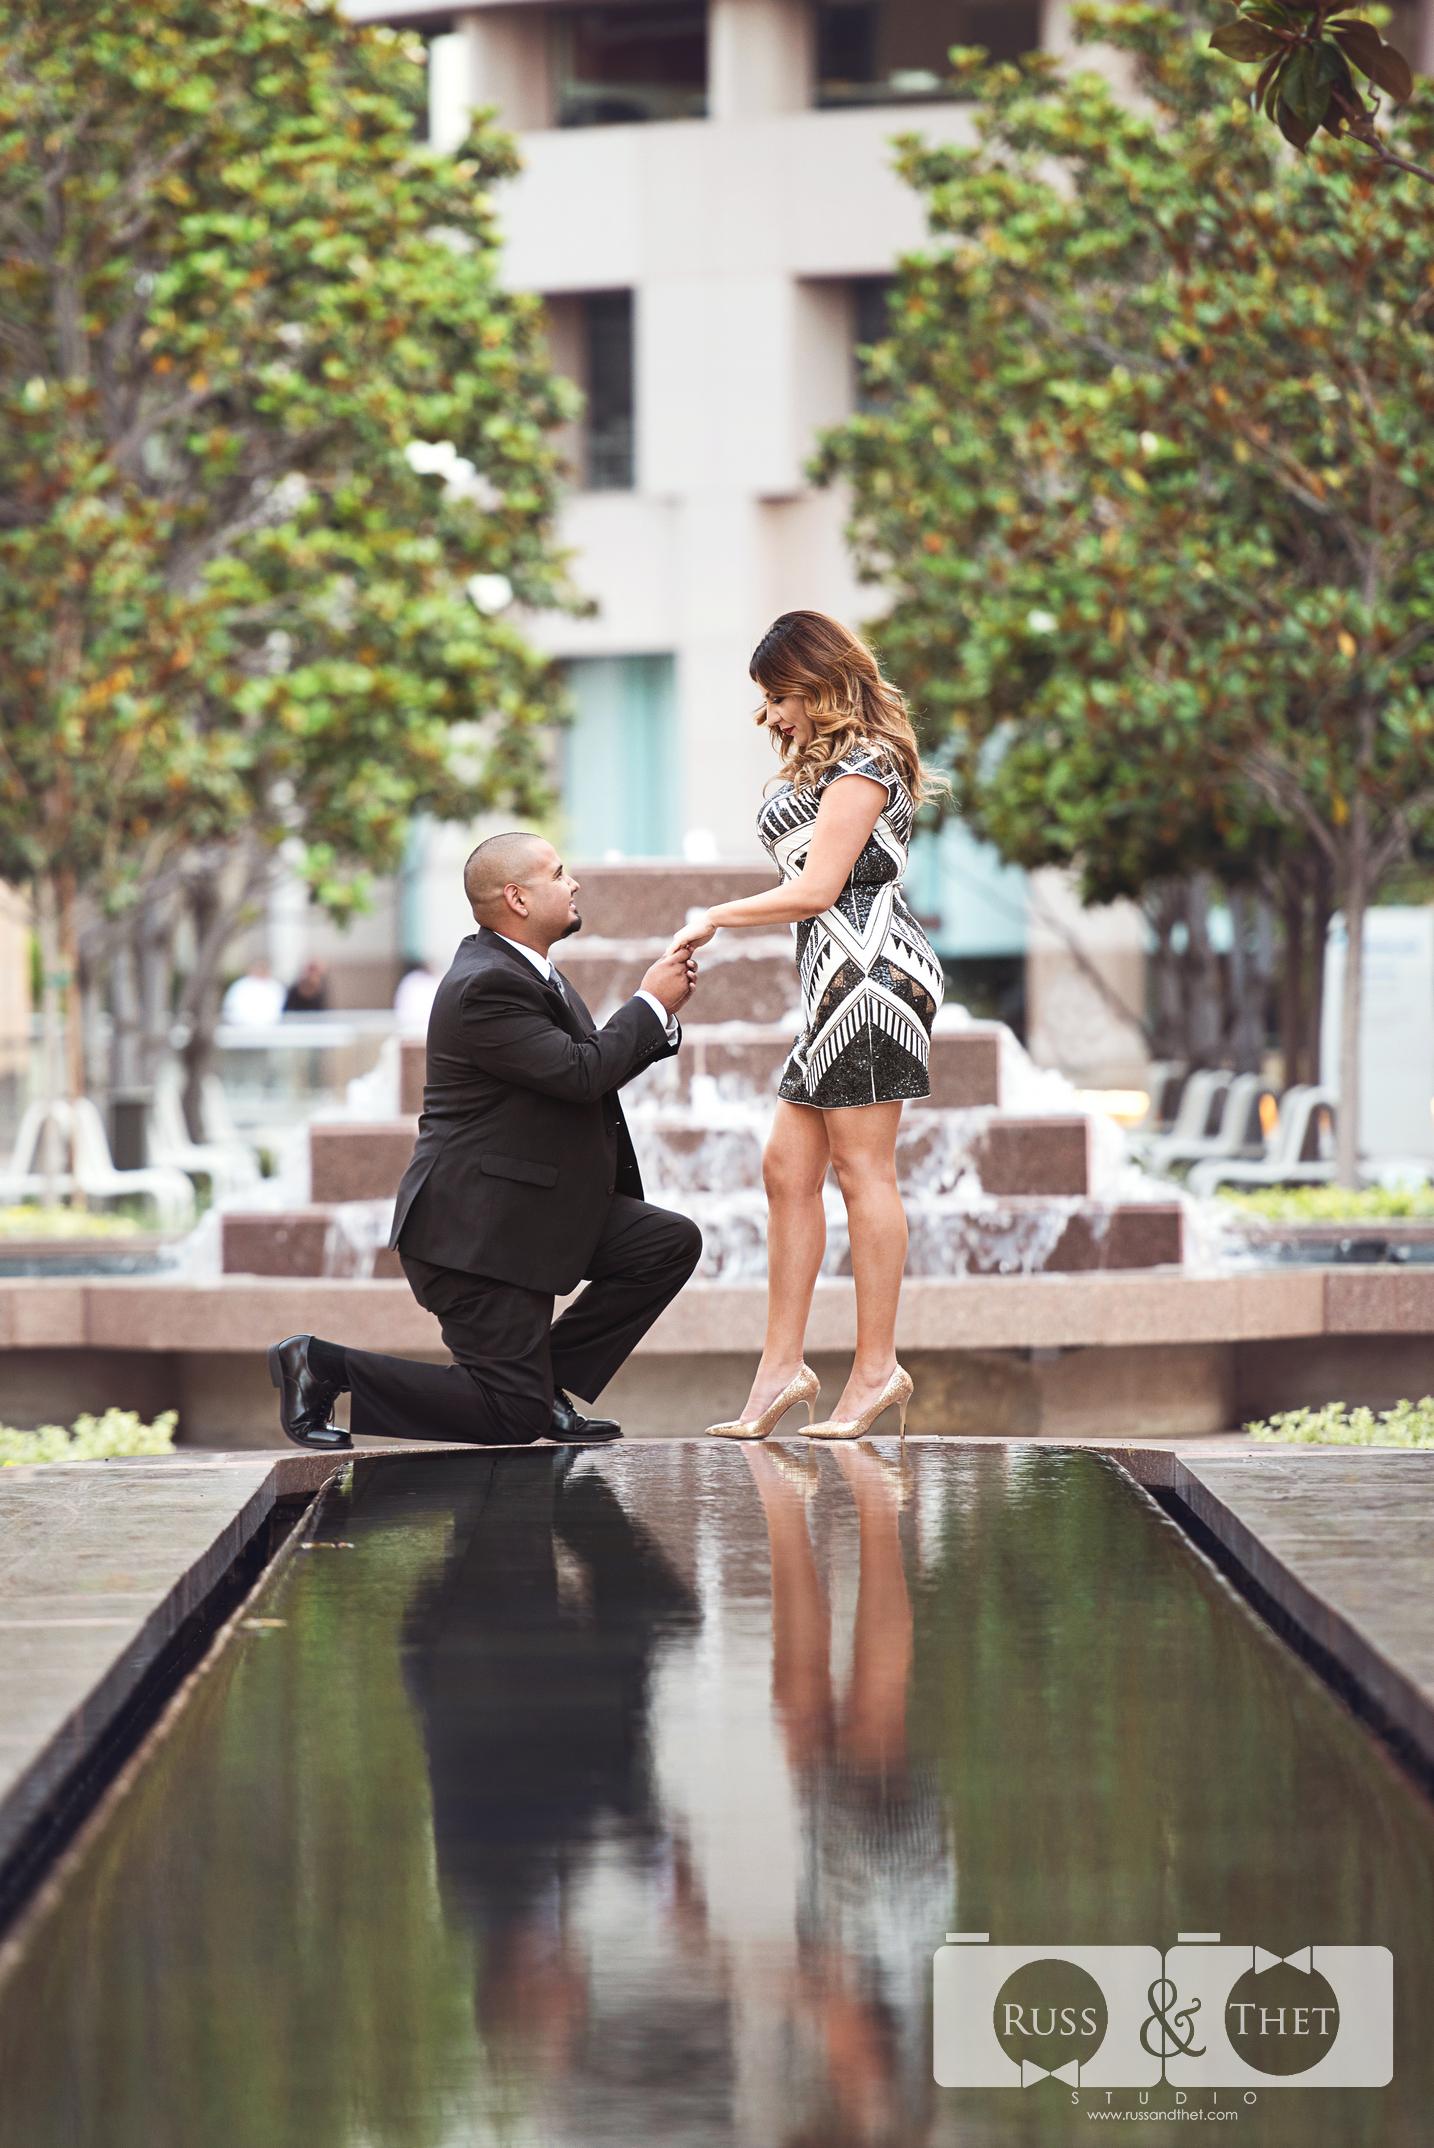 los-angeles-engagement-photographer (10).jpg